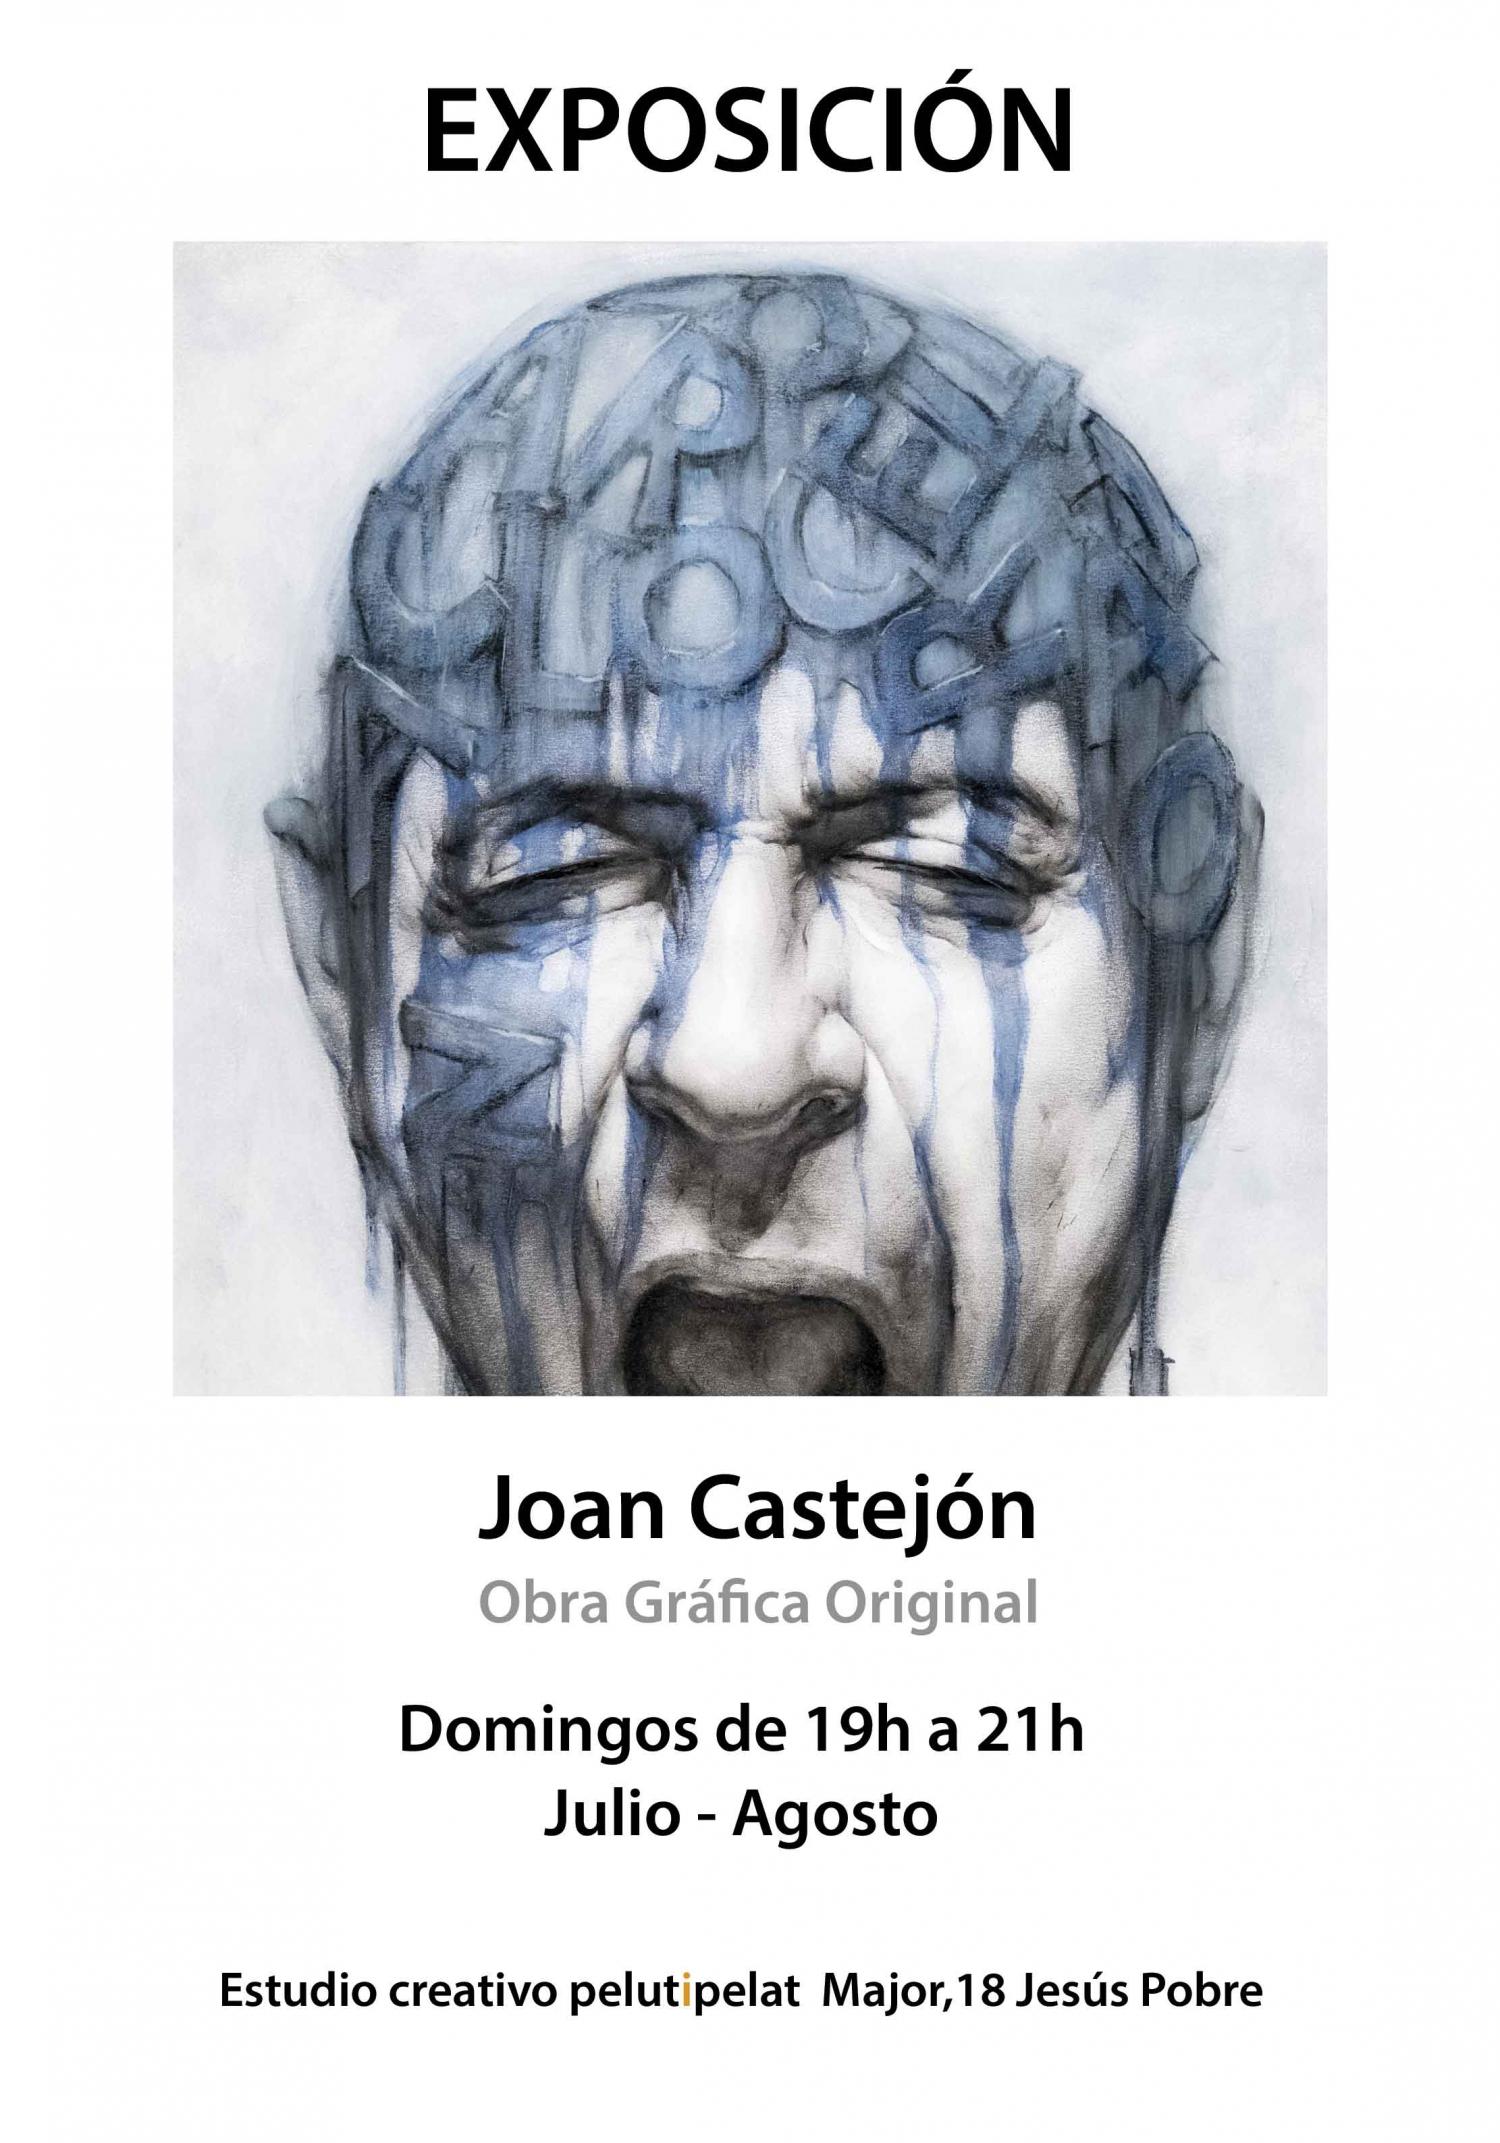 Exhibition of paintings by Joan Castejon in Jesus Pobre